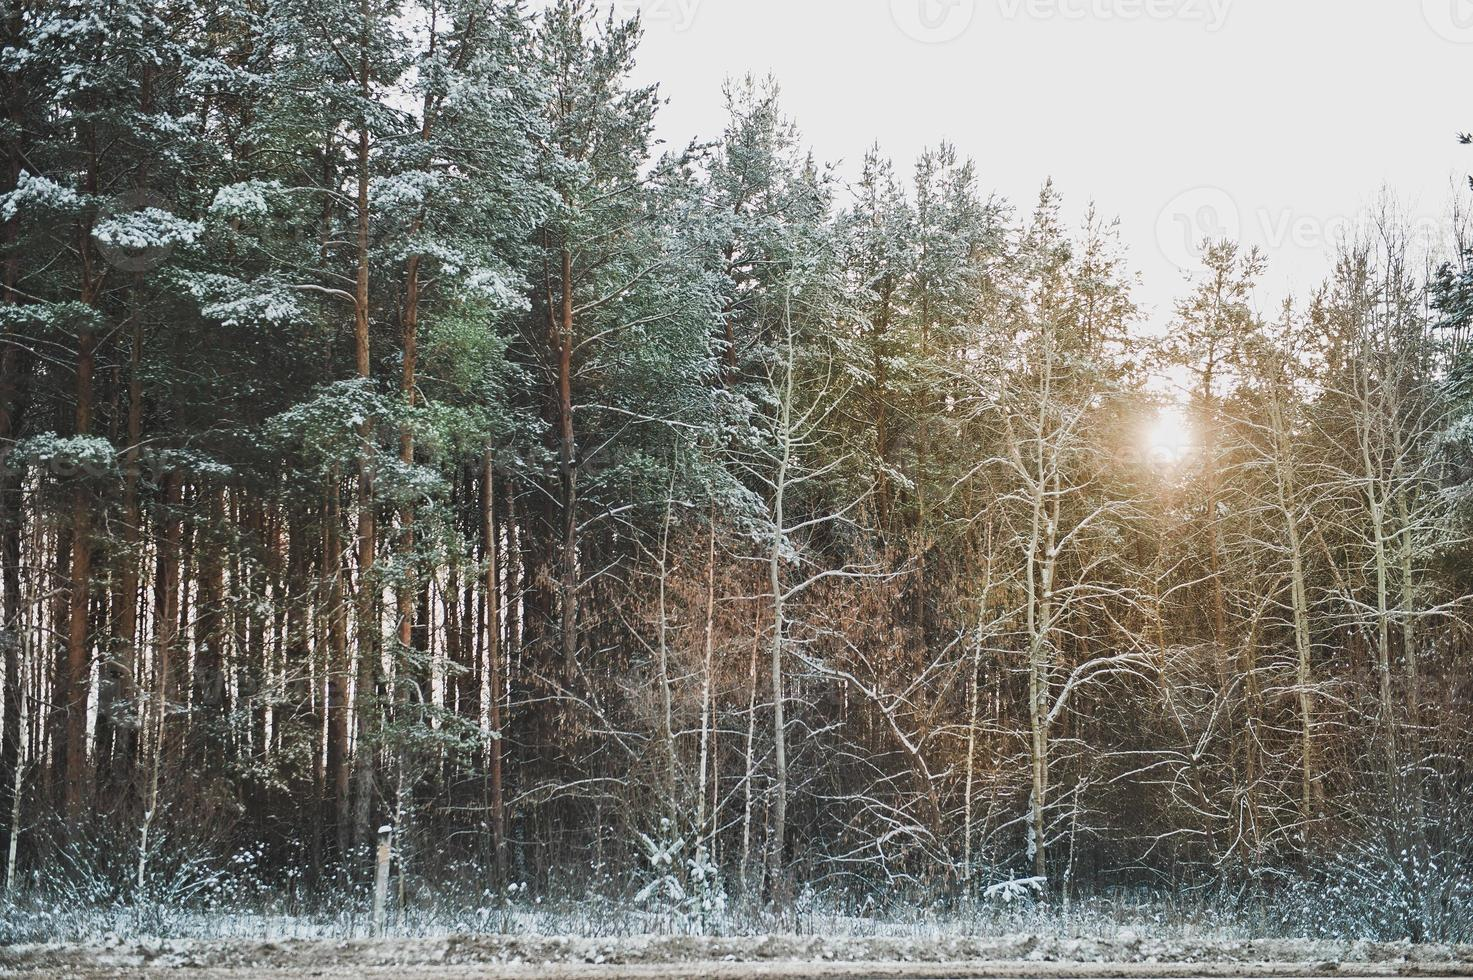 vintergranskog foto